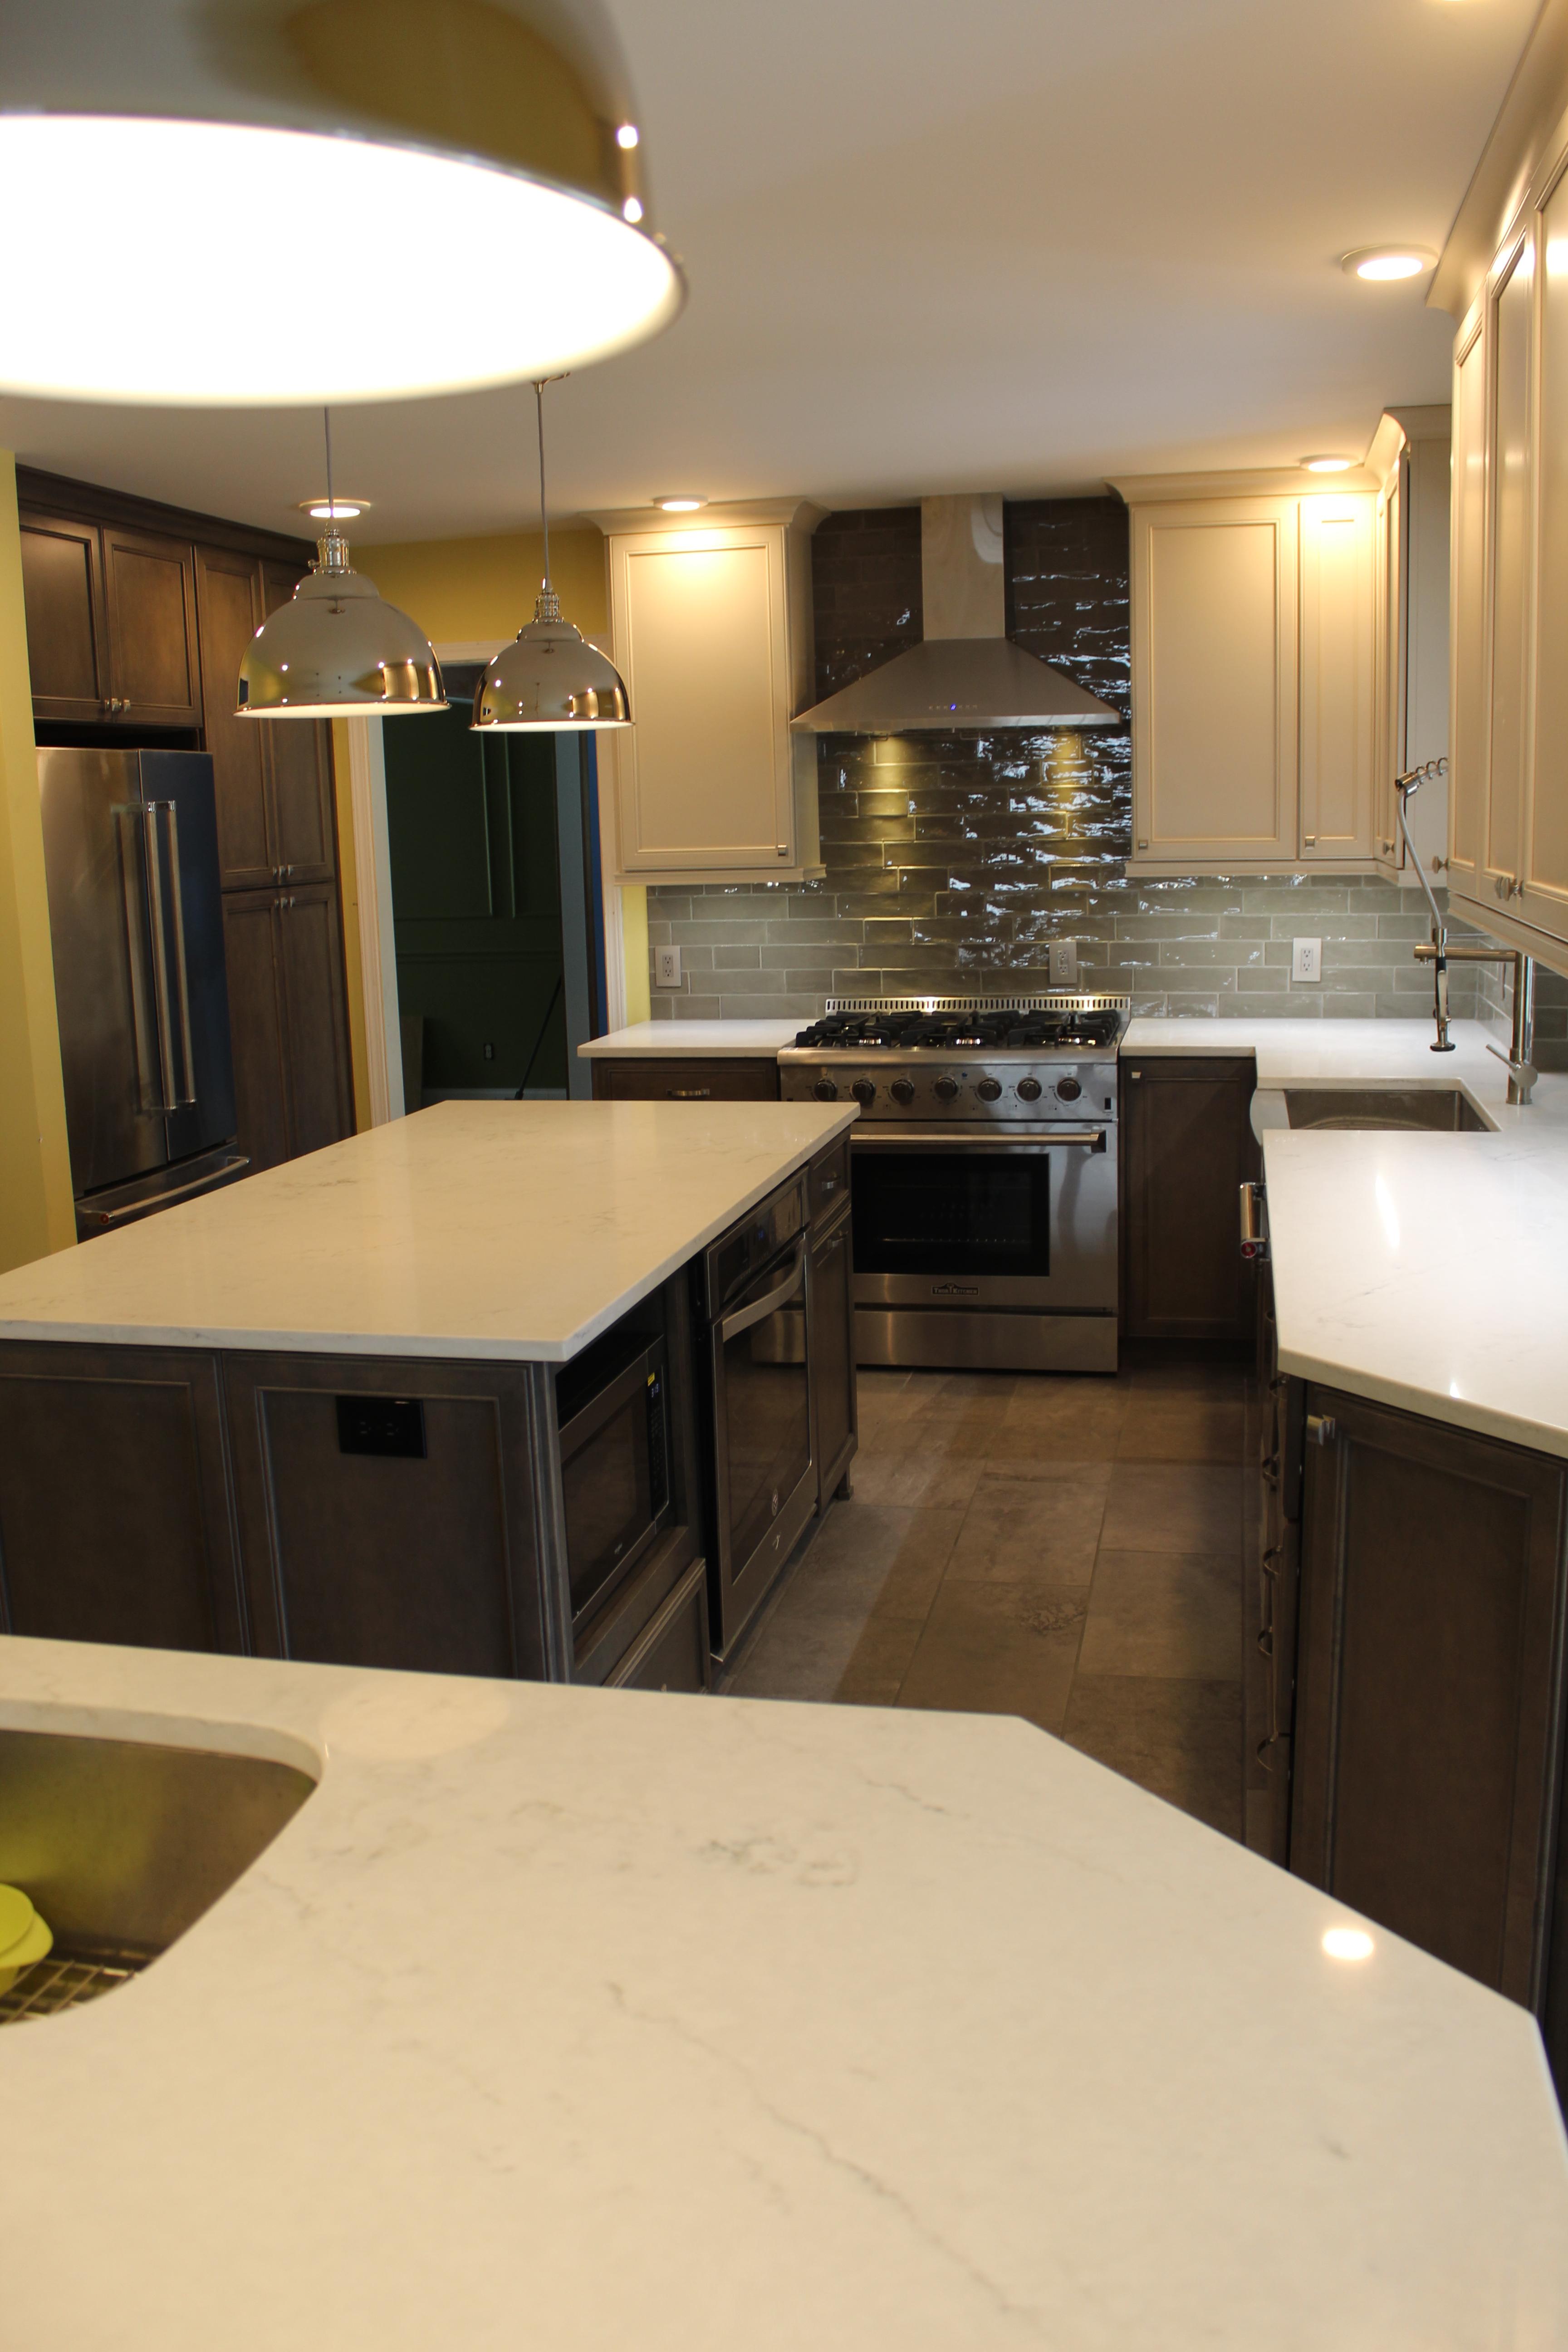 Kitchen Remodeling Contractor Companies Tonawanda Ny 3 G